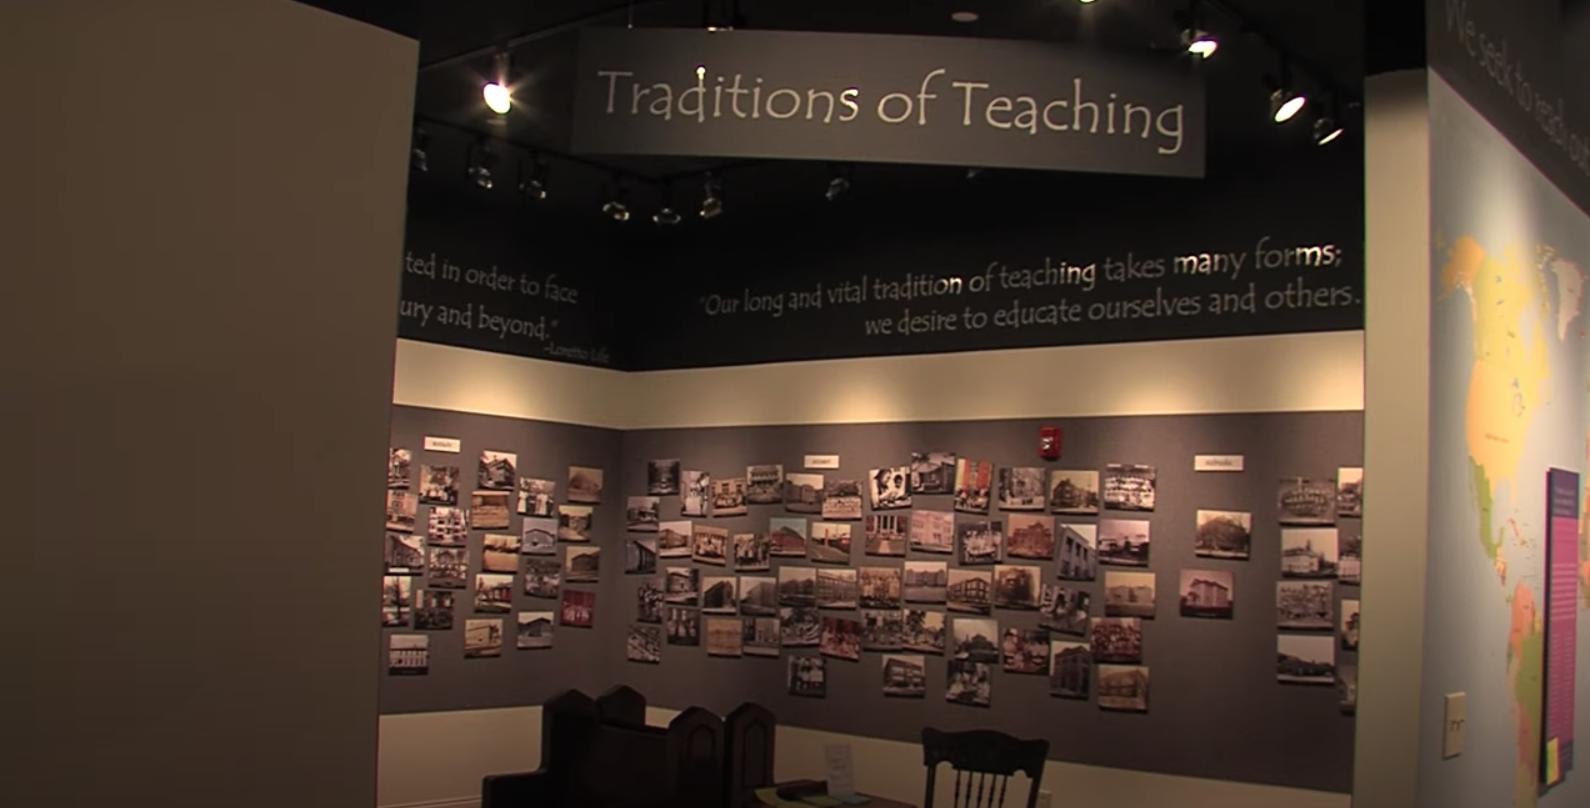 Heritage Center Room